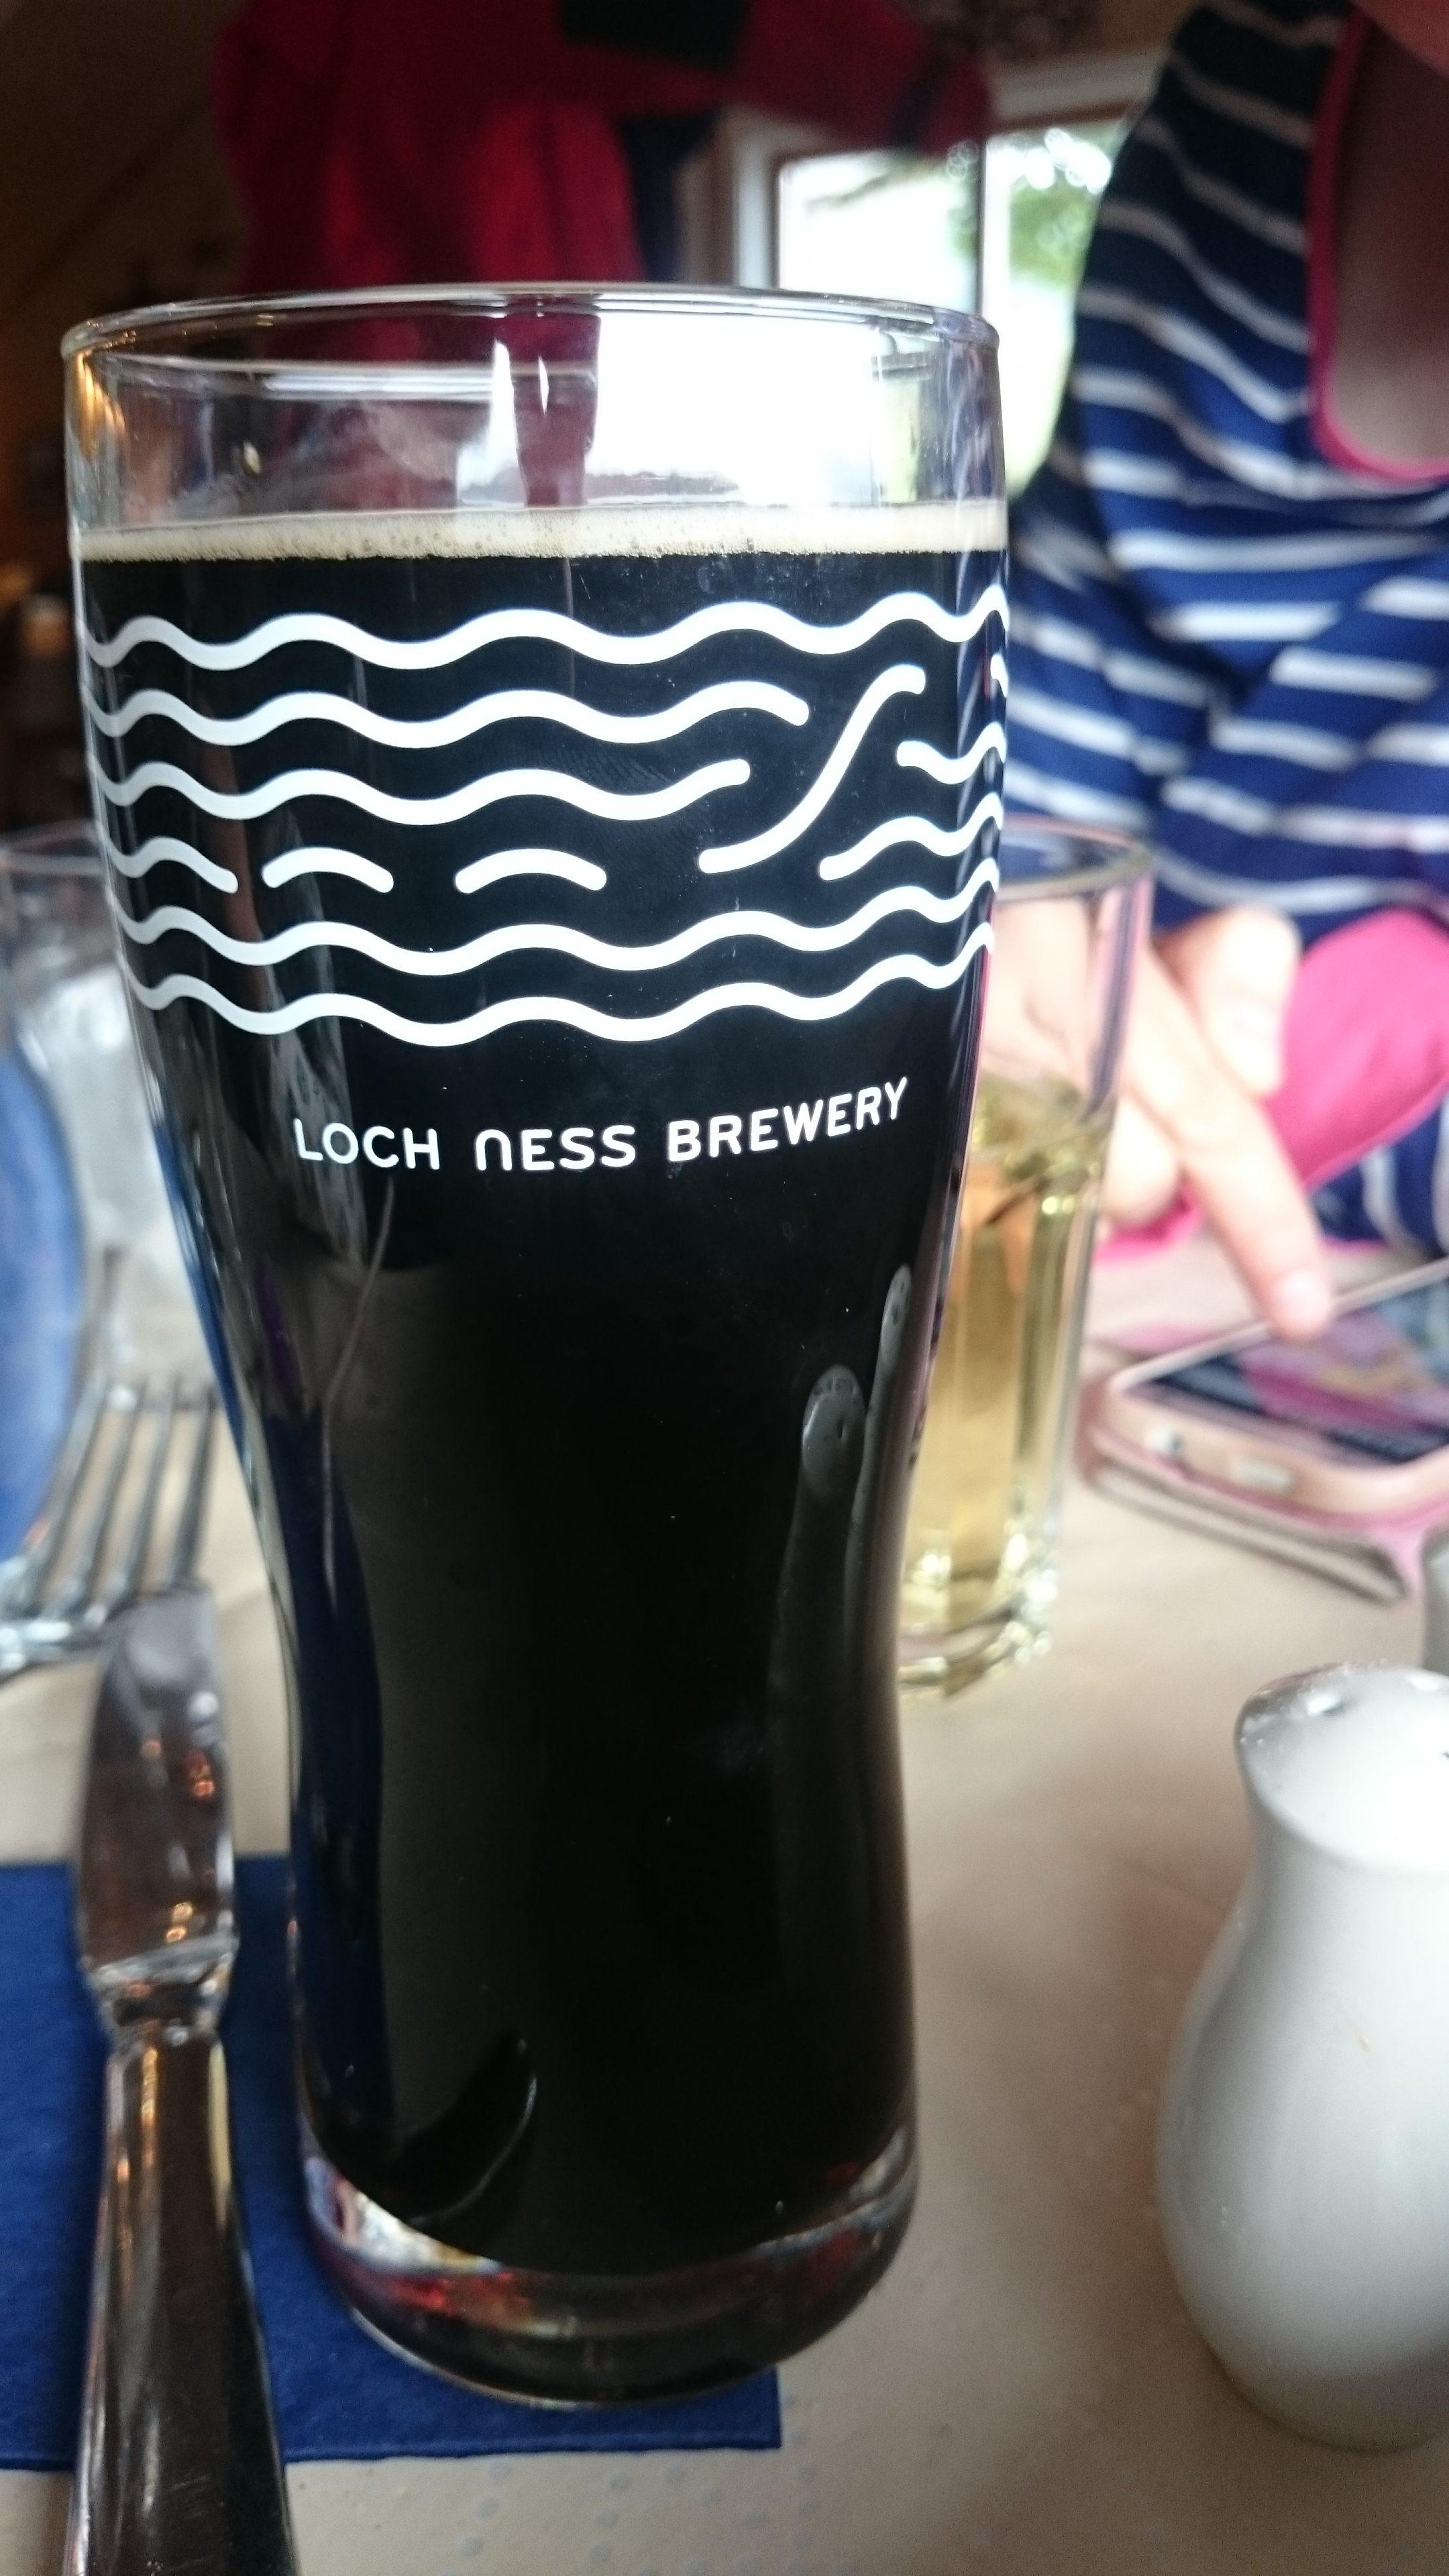 DSC_0054 - Loch Ness Brewery